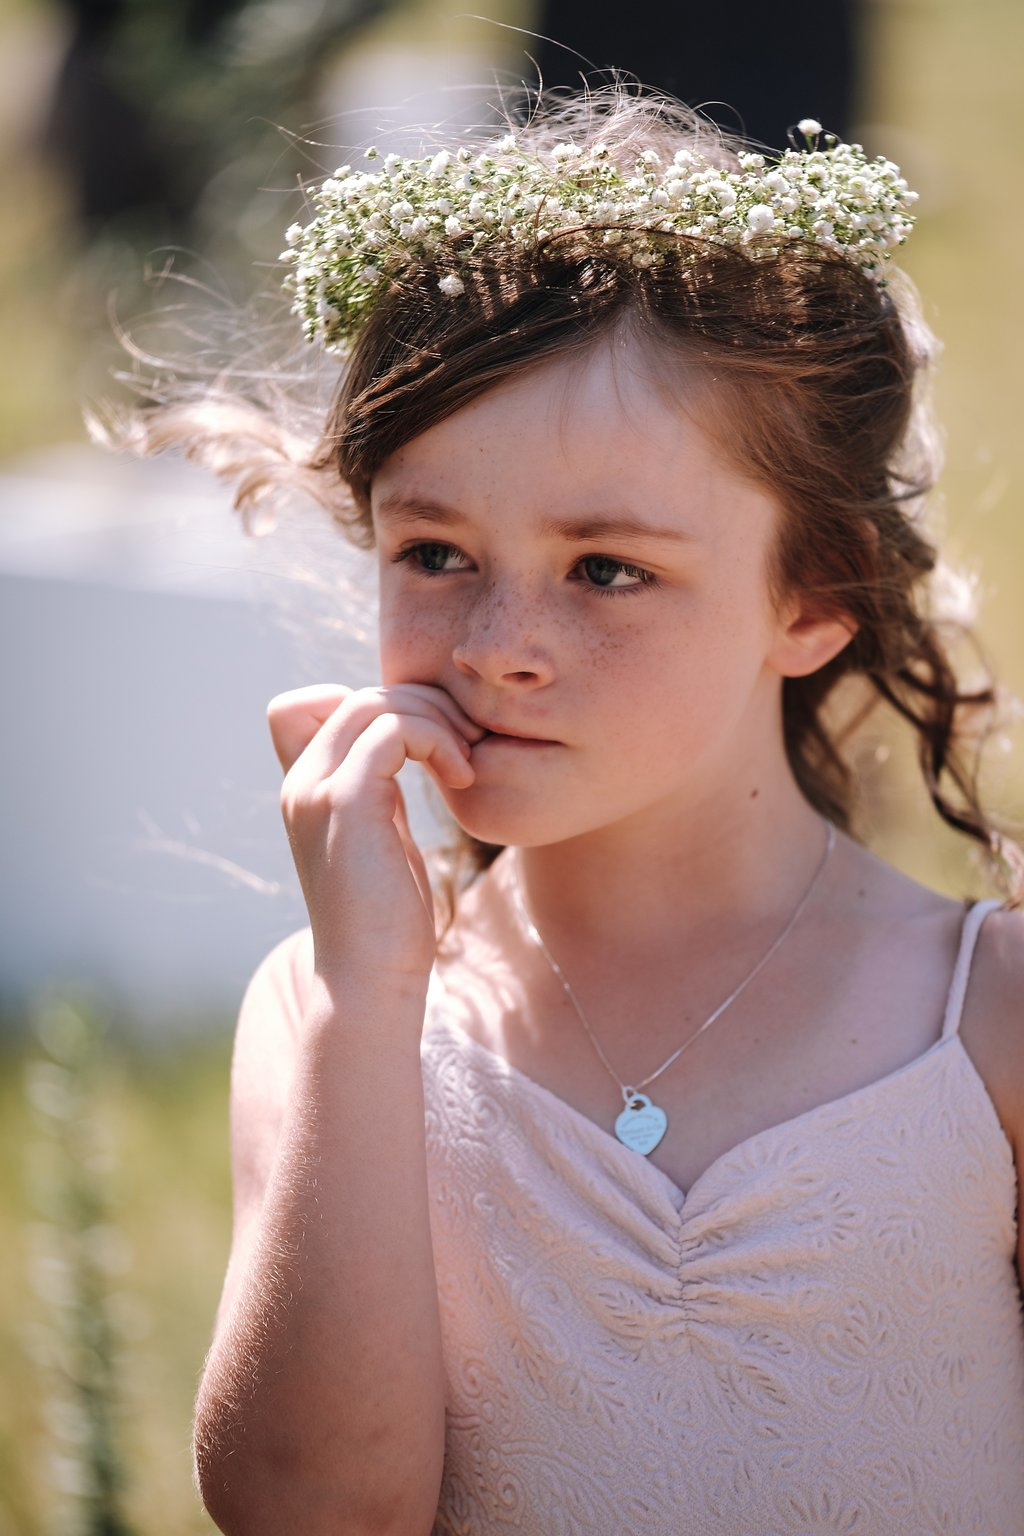 Cute Flower Girl Dresses - Farm-Forest Wedding - The Overwhelmed Bride Wedding Blog